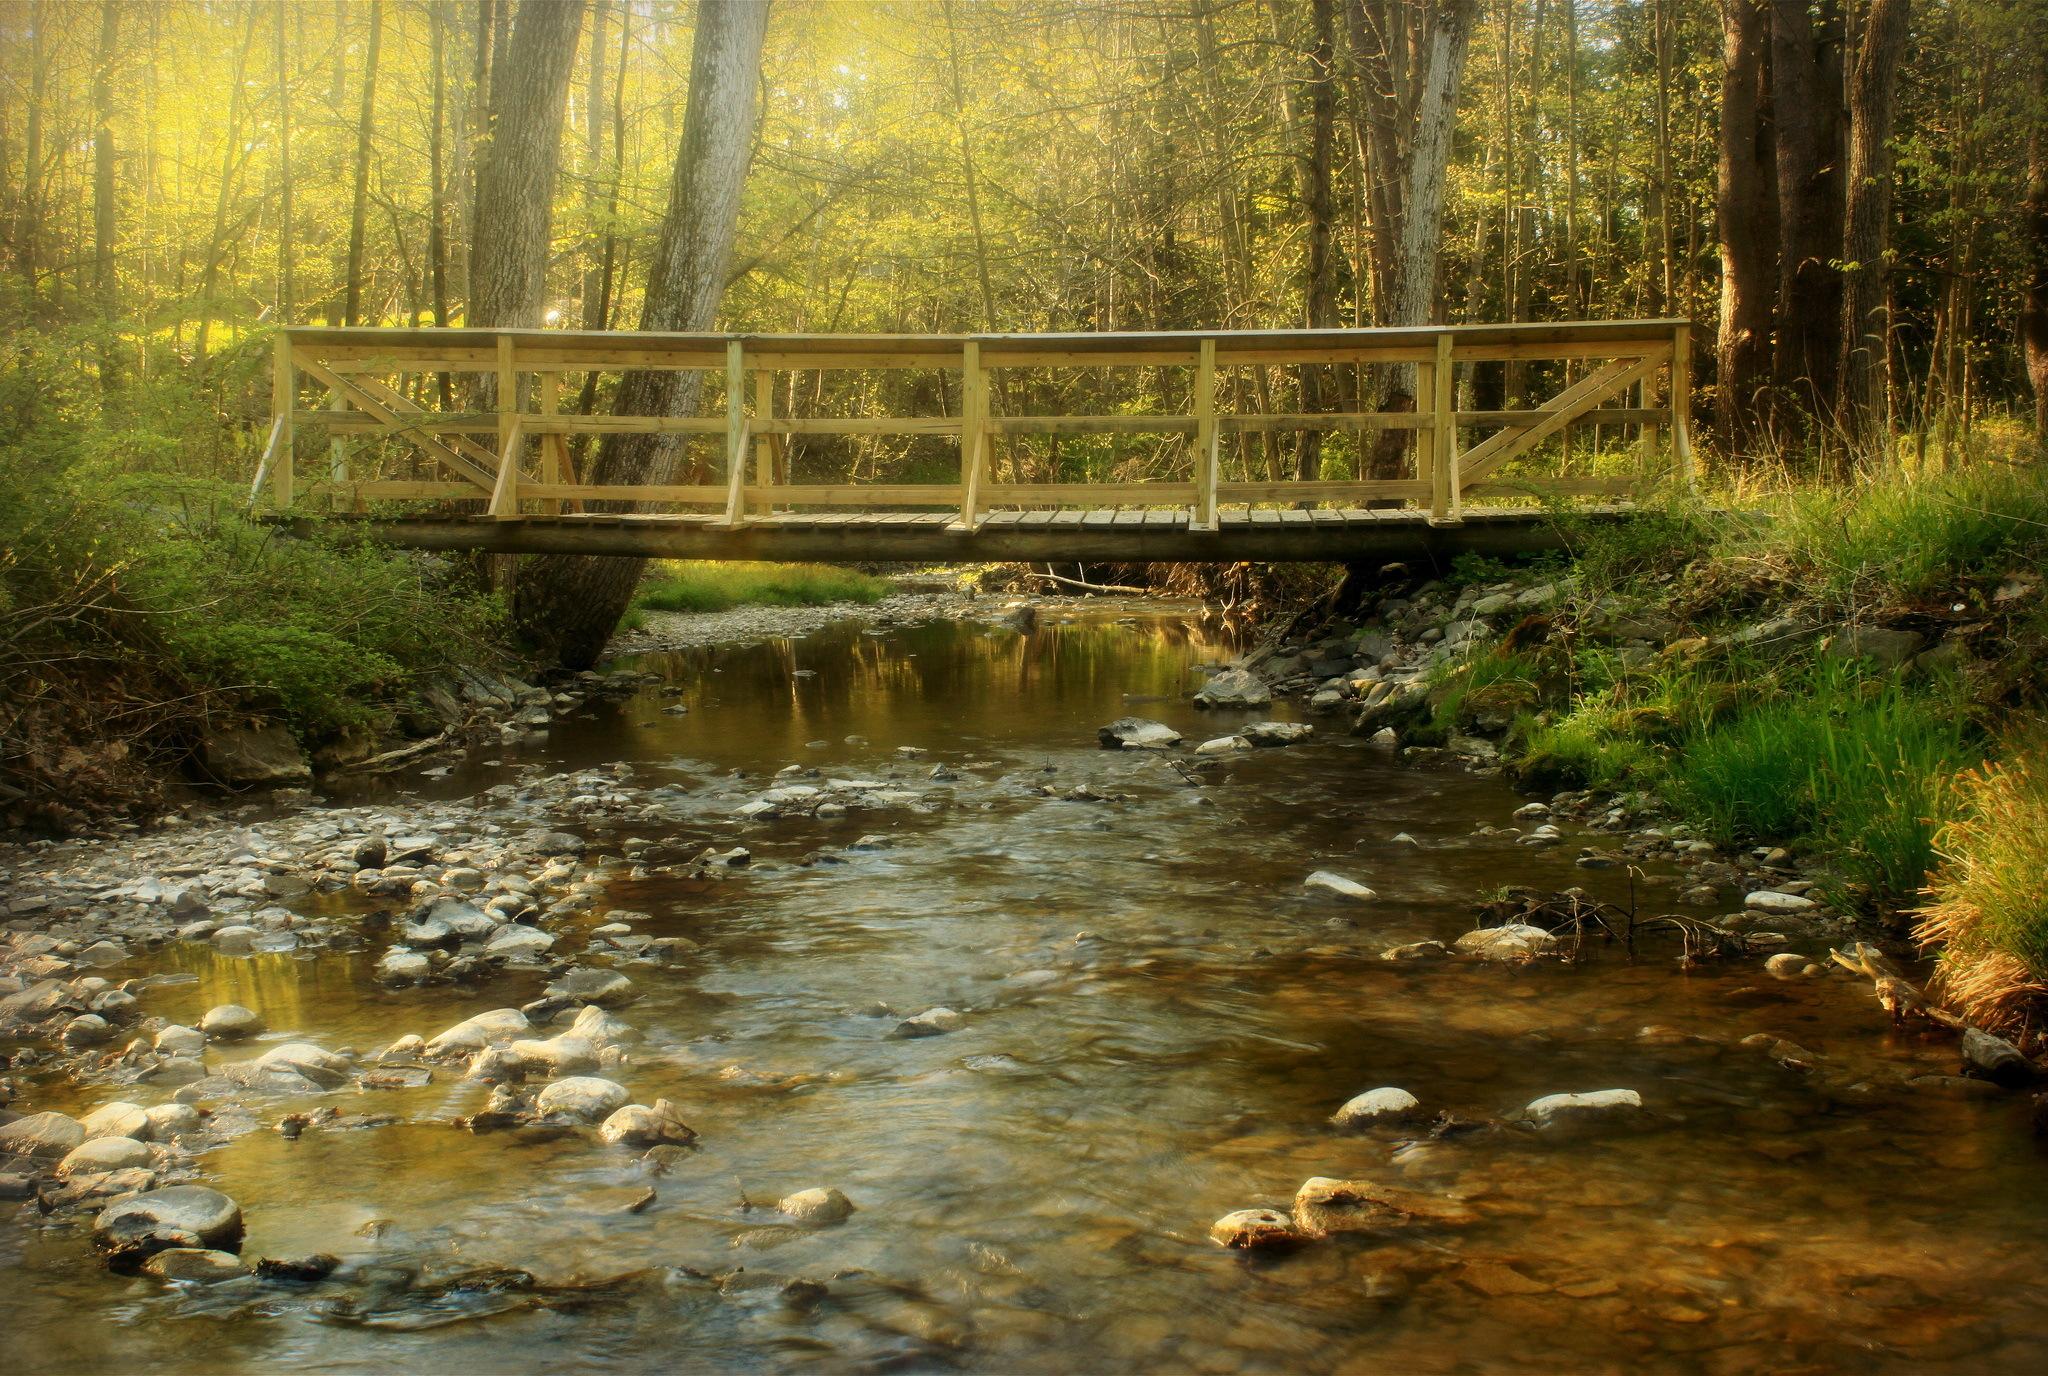 Wallpaper forest river creek bridge wallpapers nature   download 2048x1376